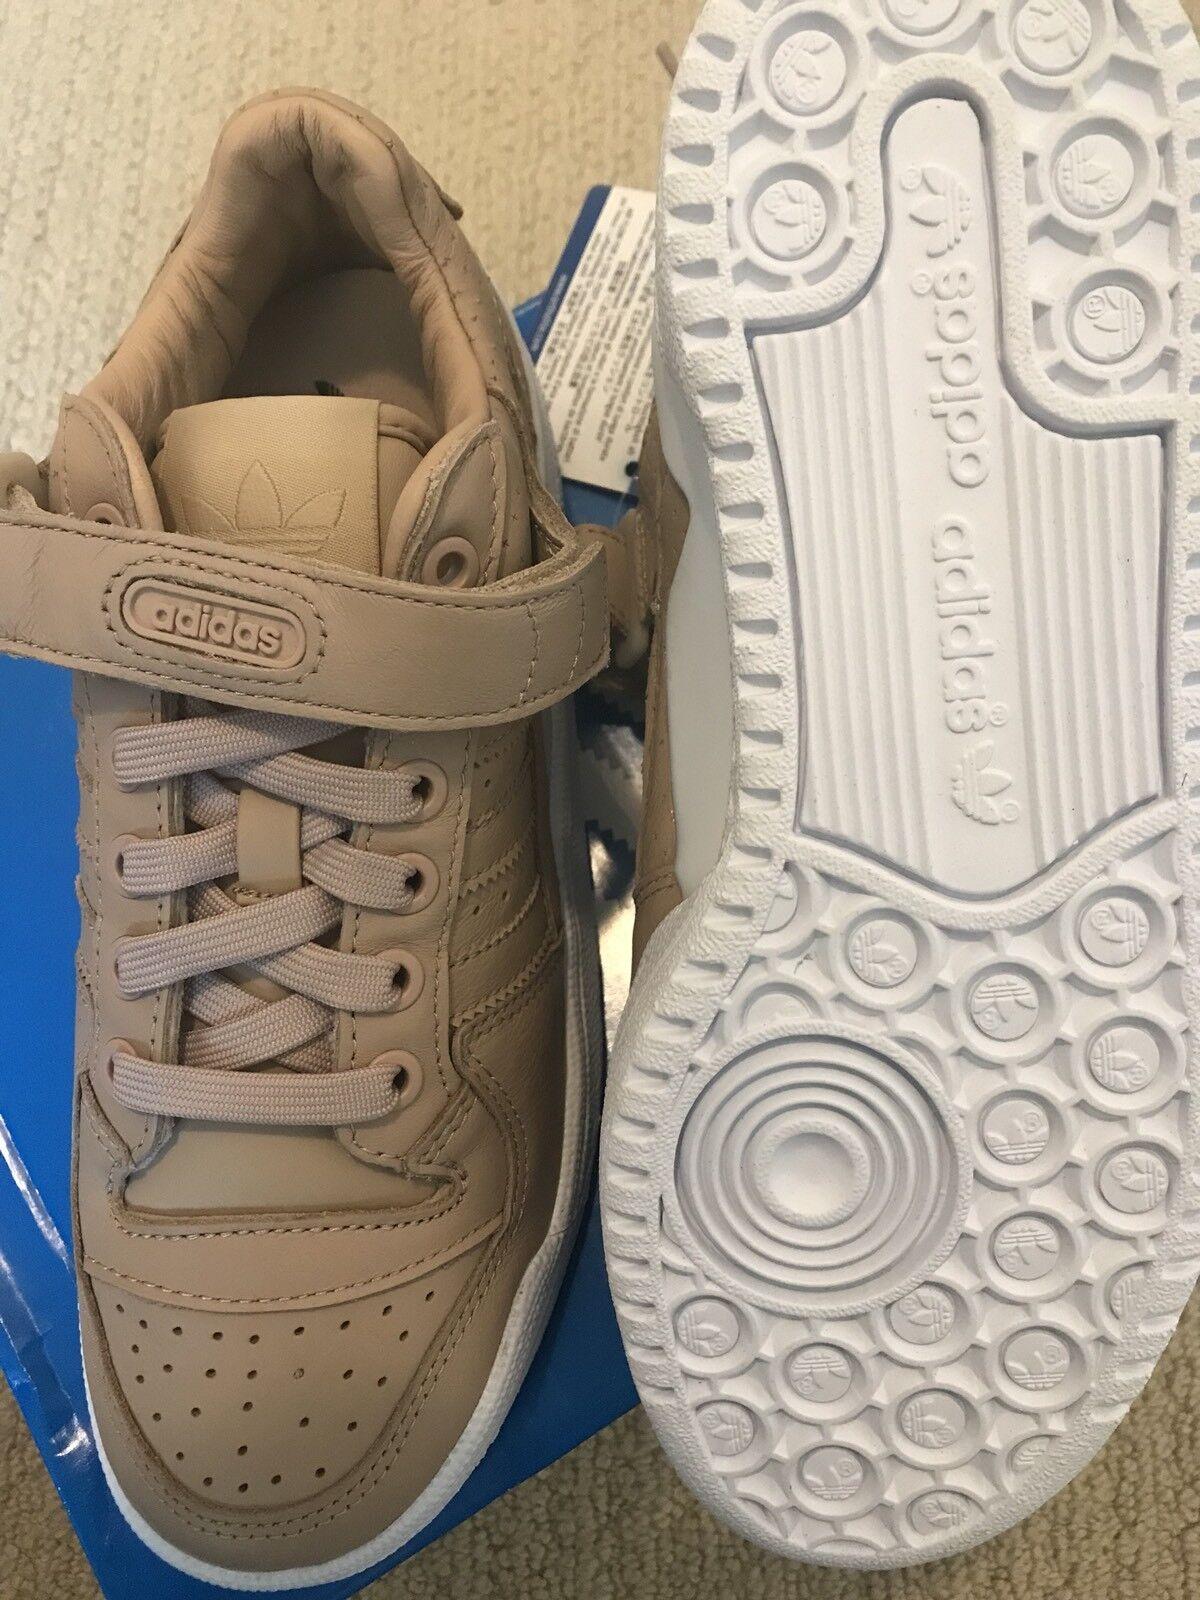 adidas forum niedrigen top - 120 trainer frauen sneaker msrp 120 - 7674bc